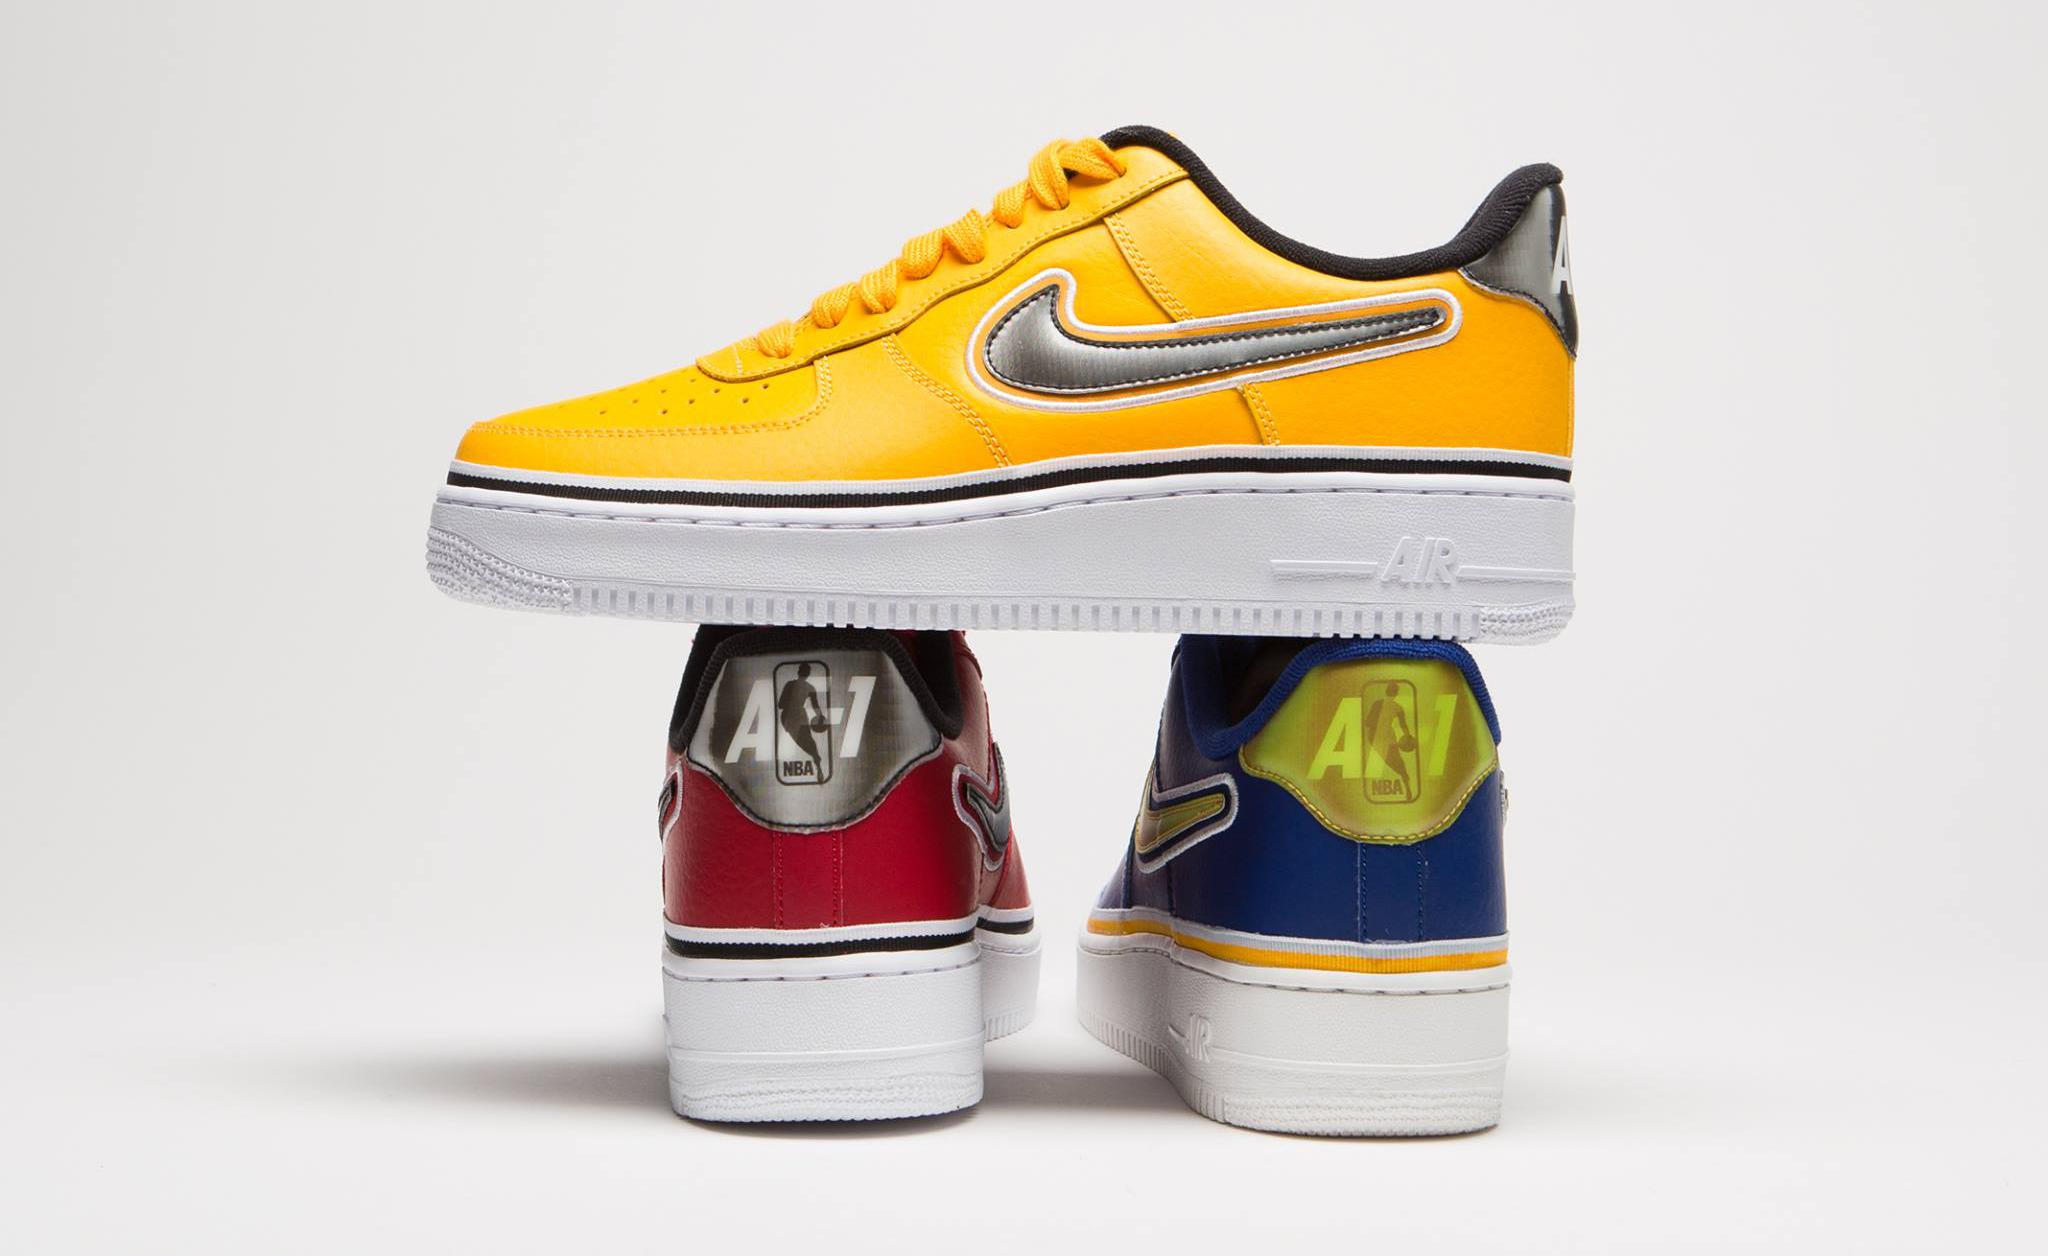 nike-air-force-1-nba-sneakers